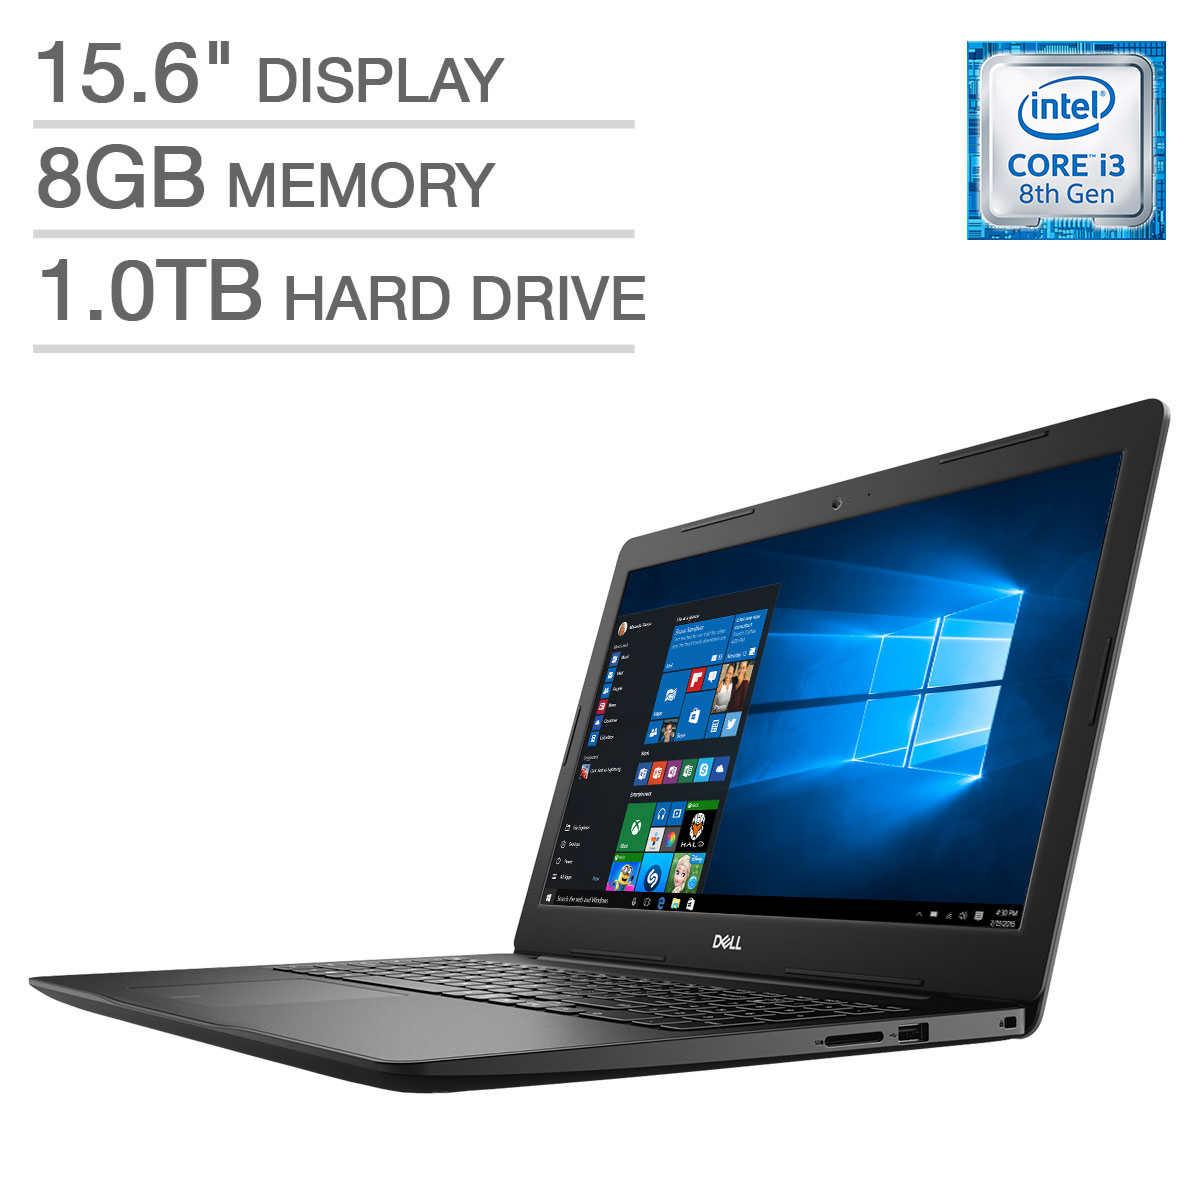 Dell Inspiron 15 3000 Laptop - Intel Core i3